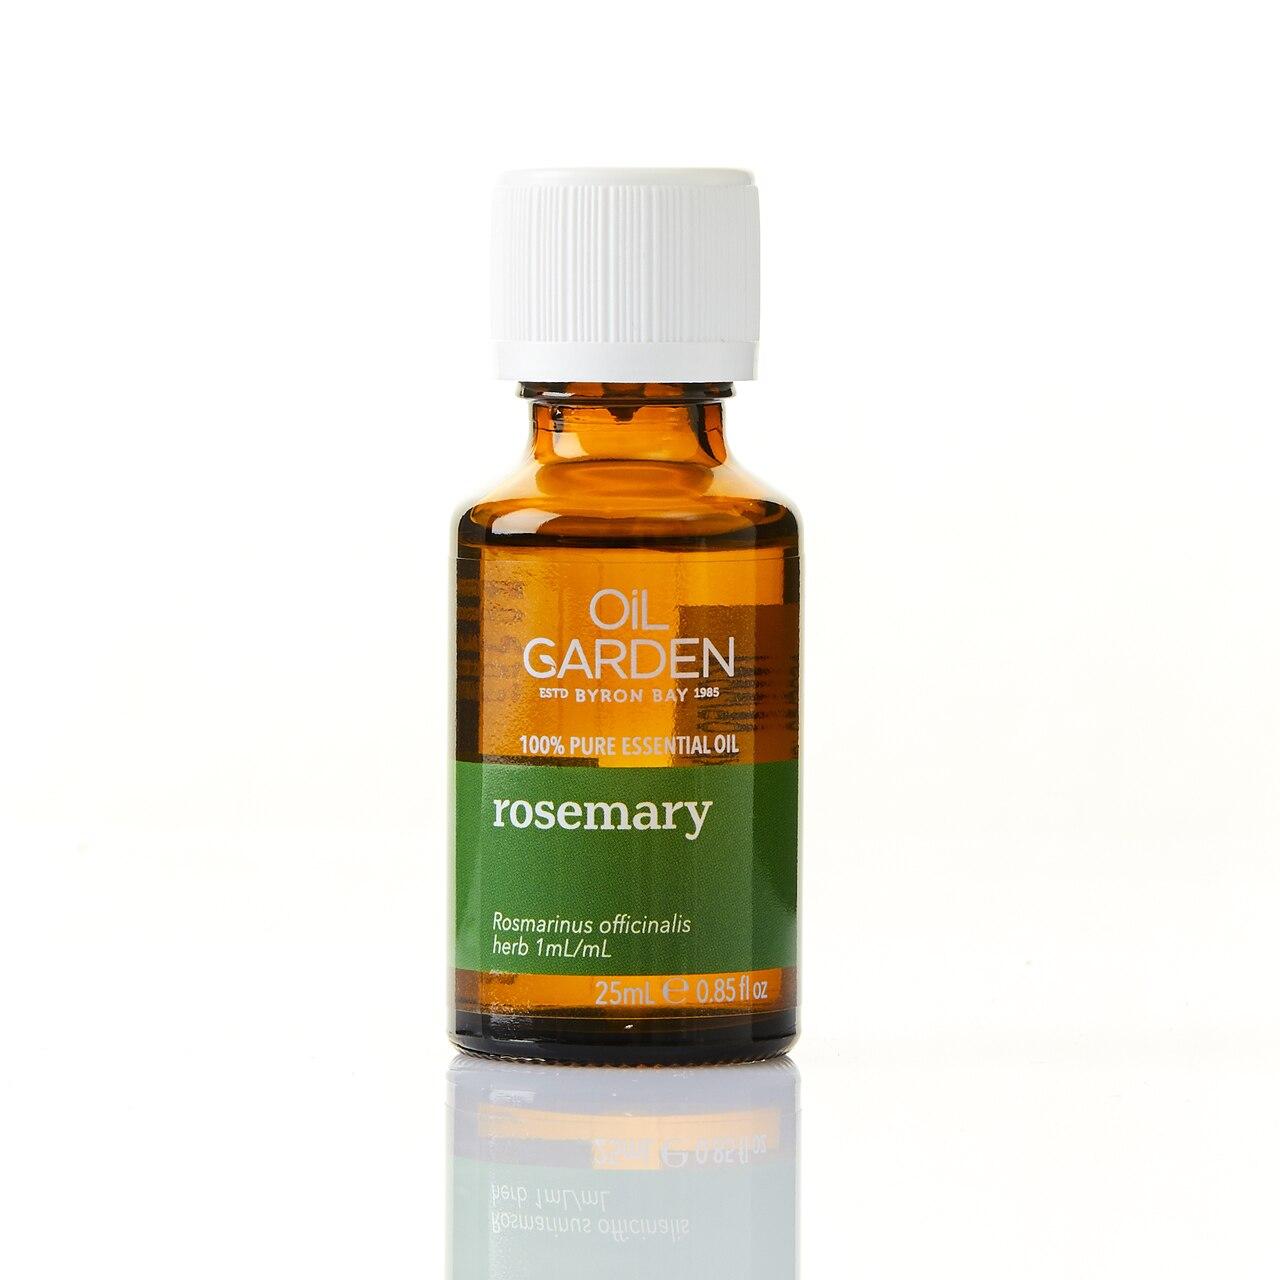 Oil Garden Rosemary Pure Essential Oil 25mL 6620080